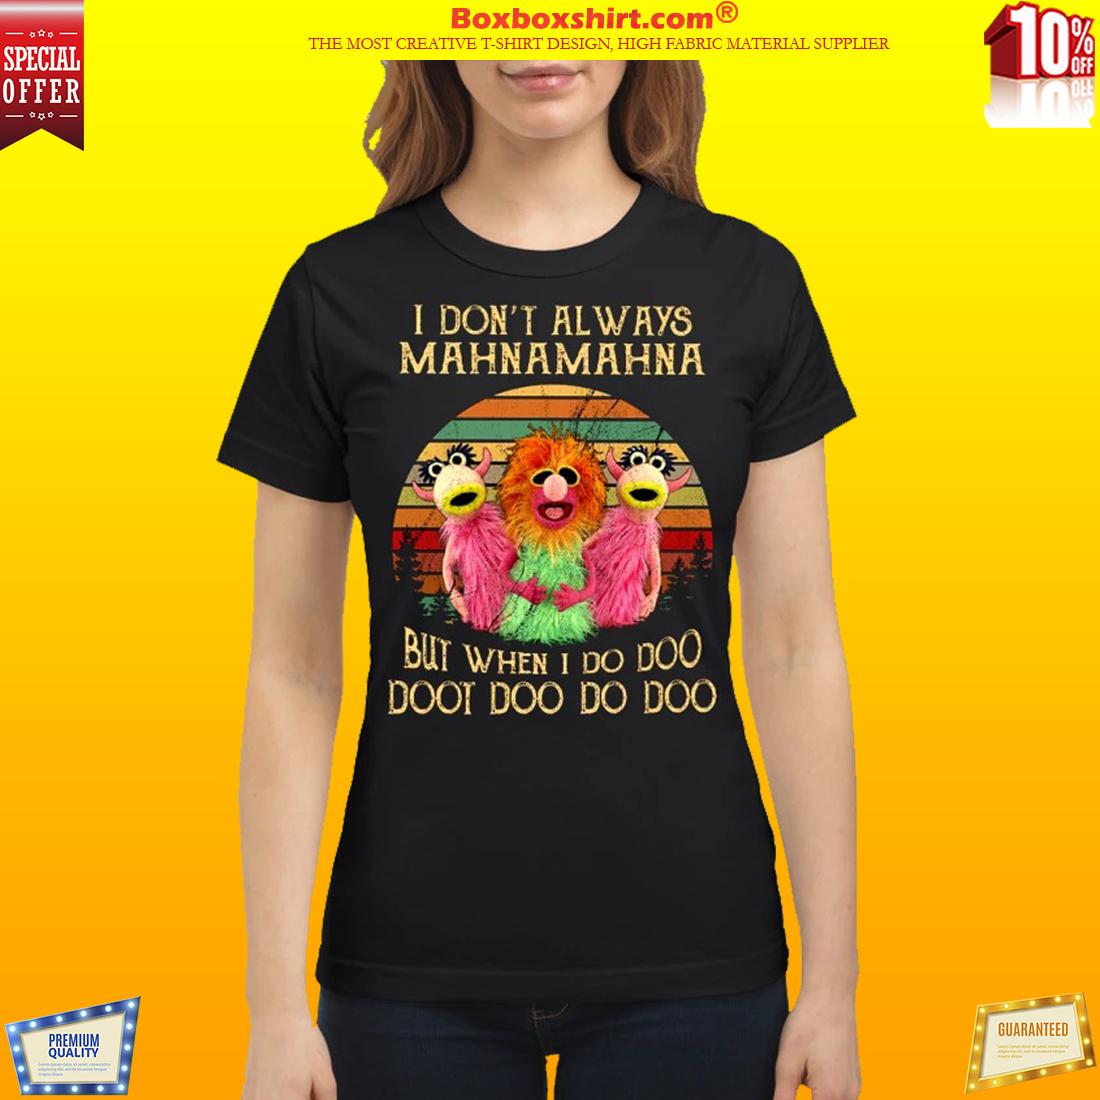 The Muppet I don't always Mahnamahna classic shirt